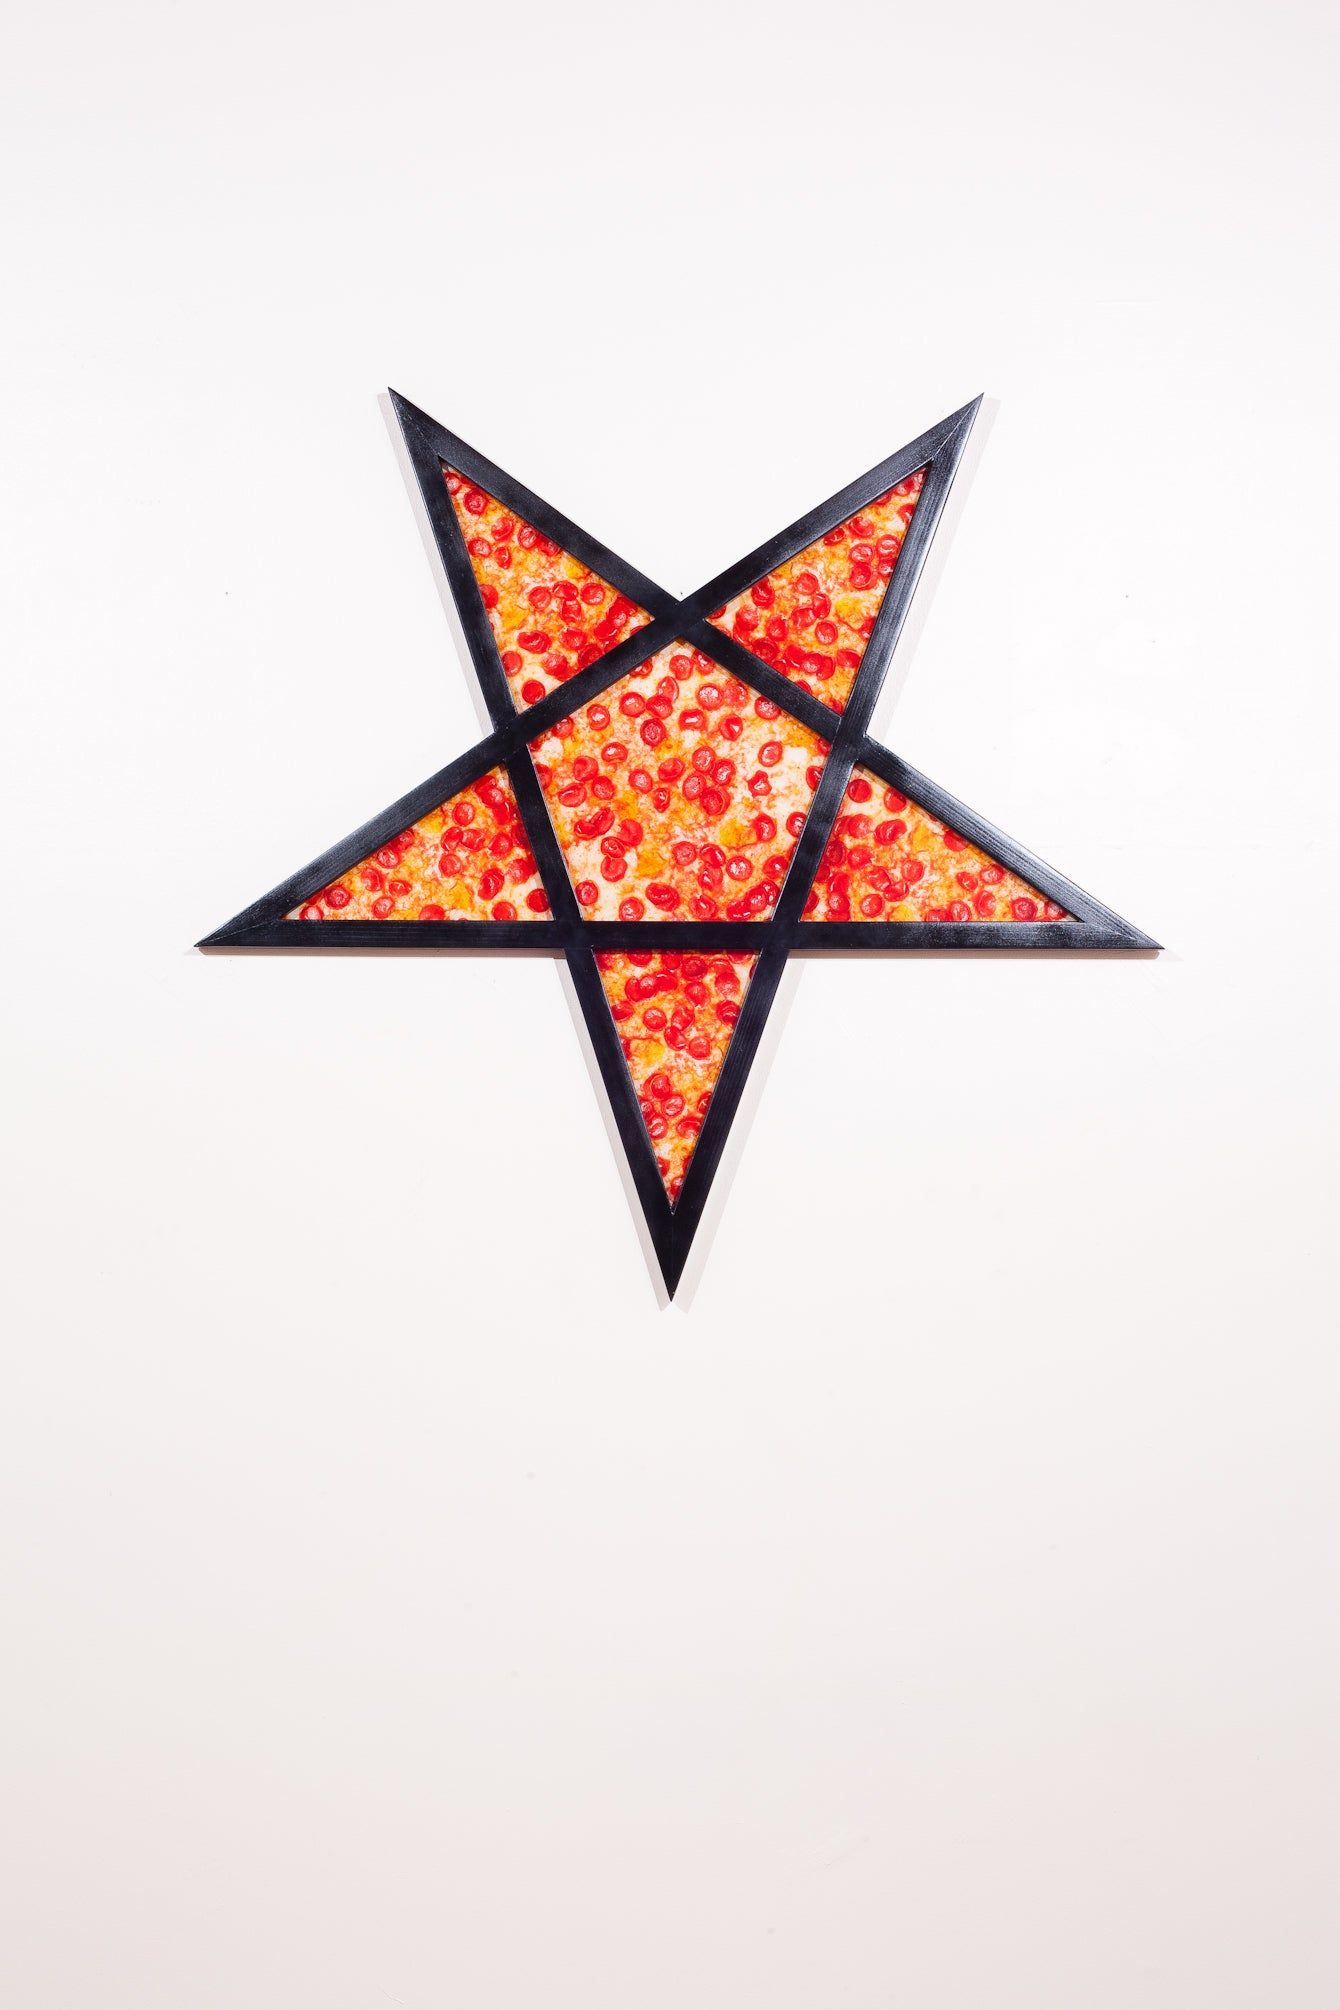 Image of Hand Made -Redwood- Pizza Pentagram